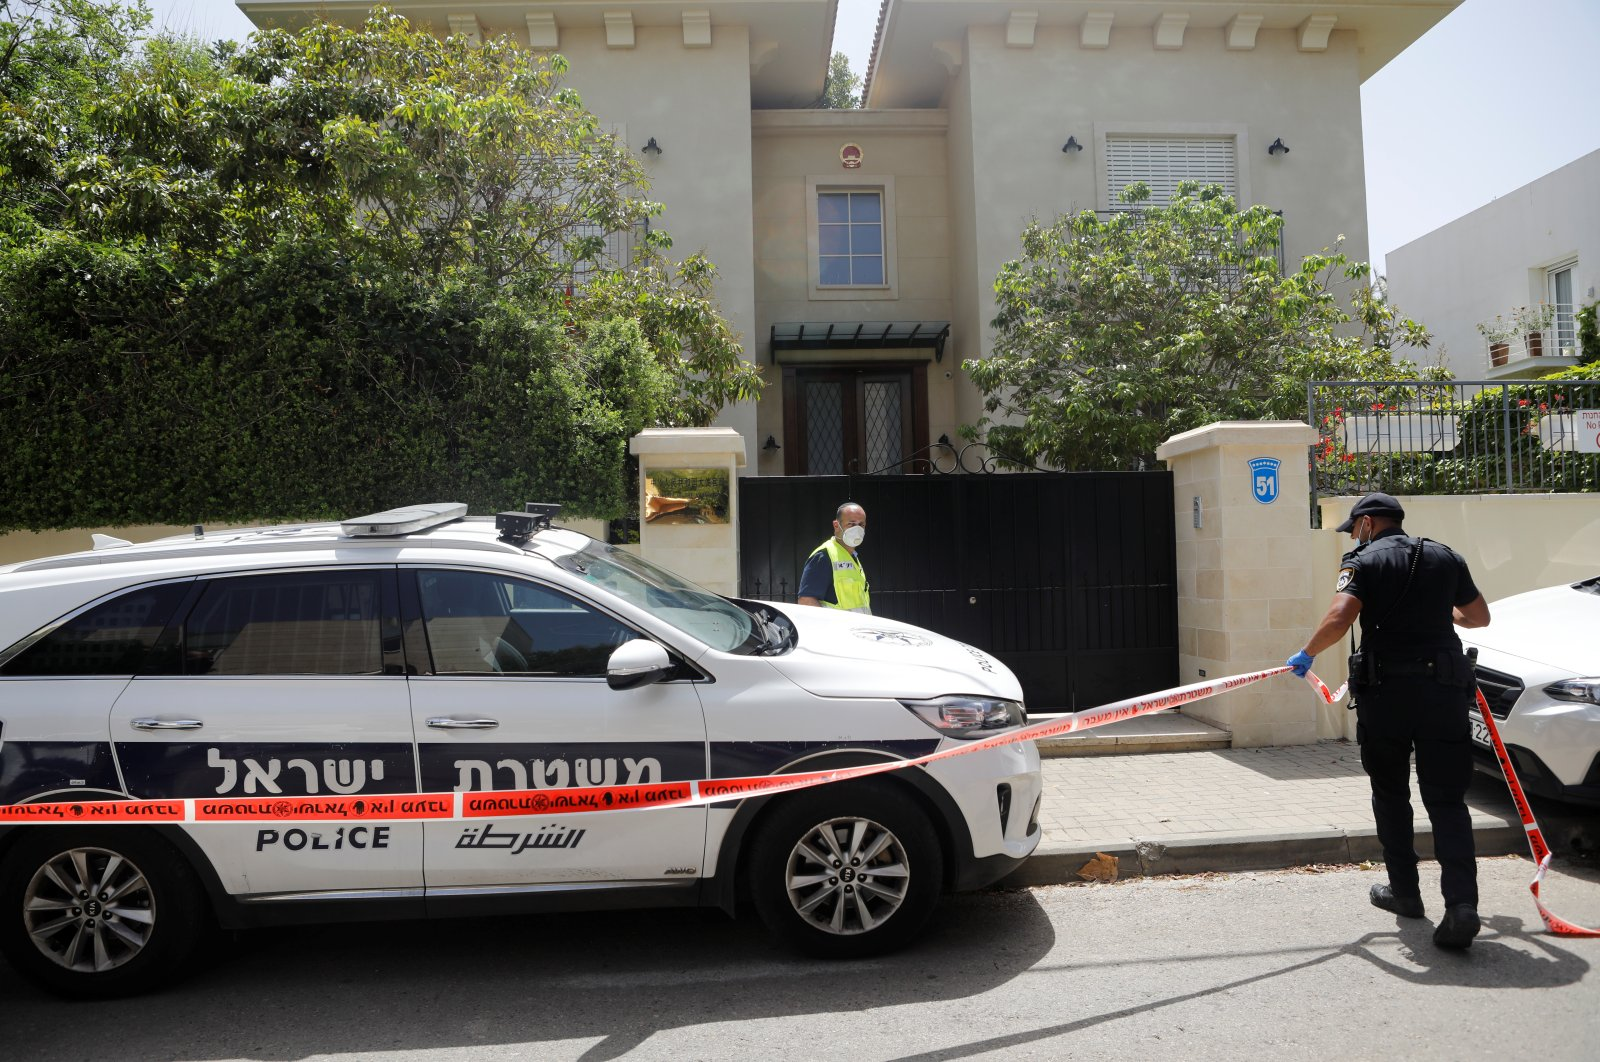 An Israeli policeman cordons off an area near the house of China's ambassador to Israel, Du Wei, in Herzliya, near Tel Aviv, Israel May 17, 2020. (Reuters Photo)